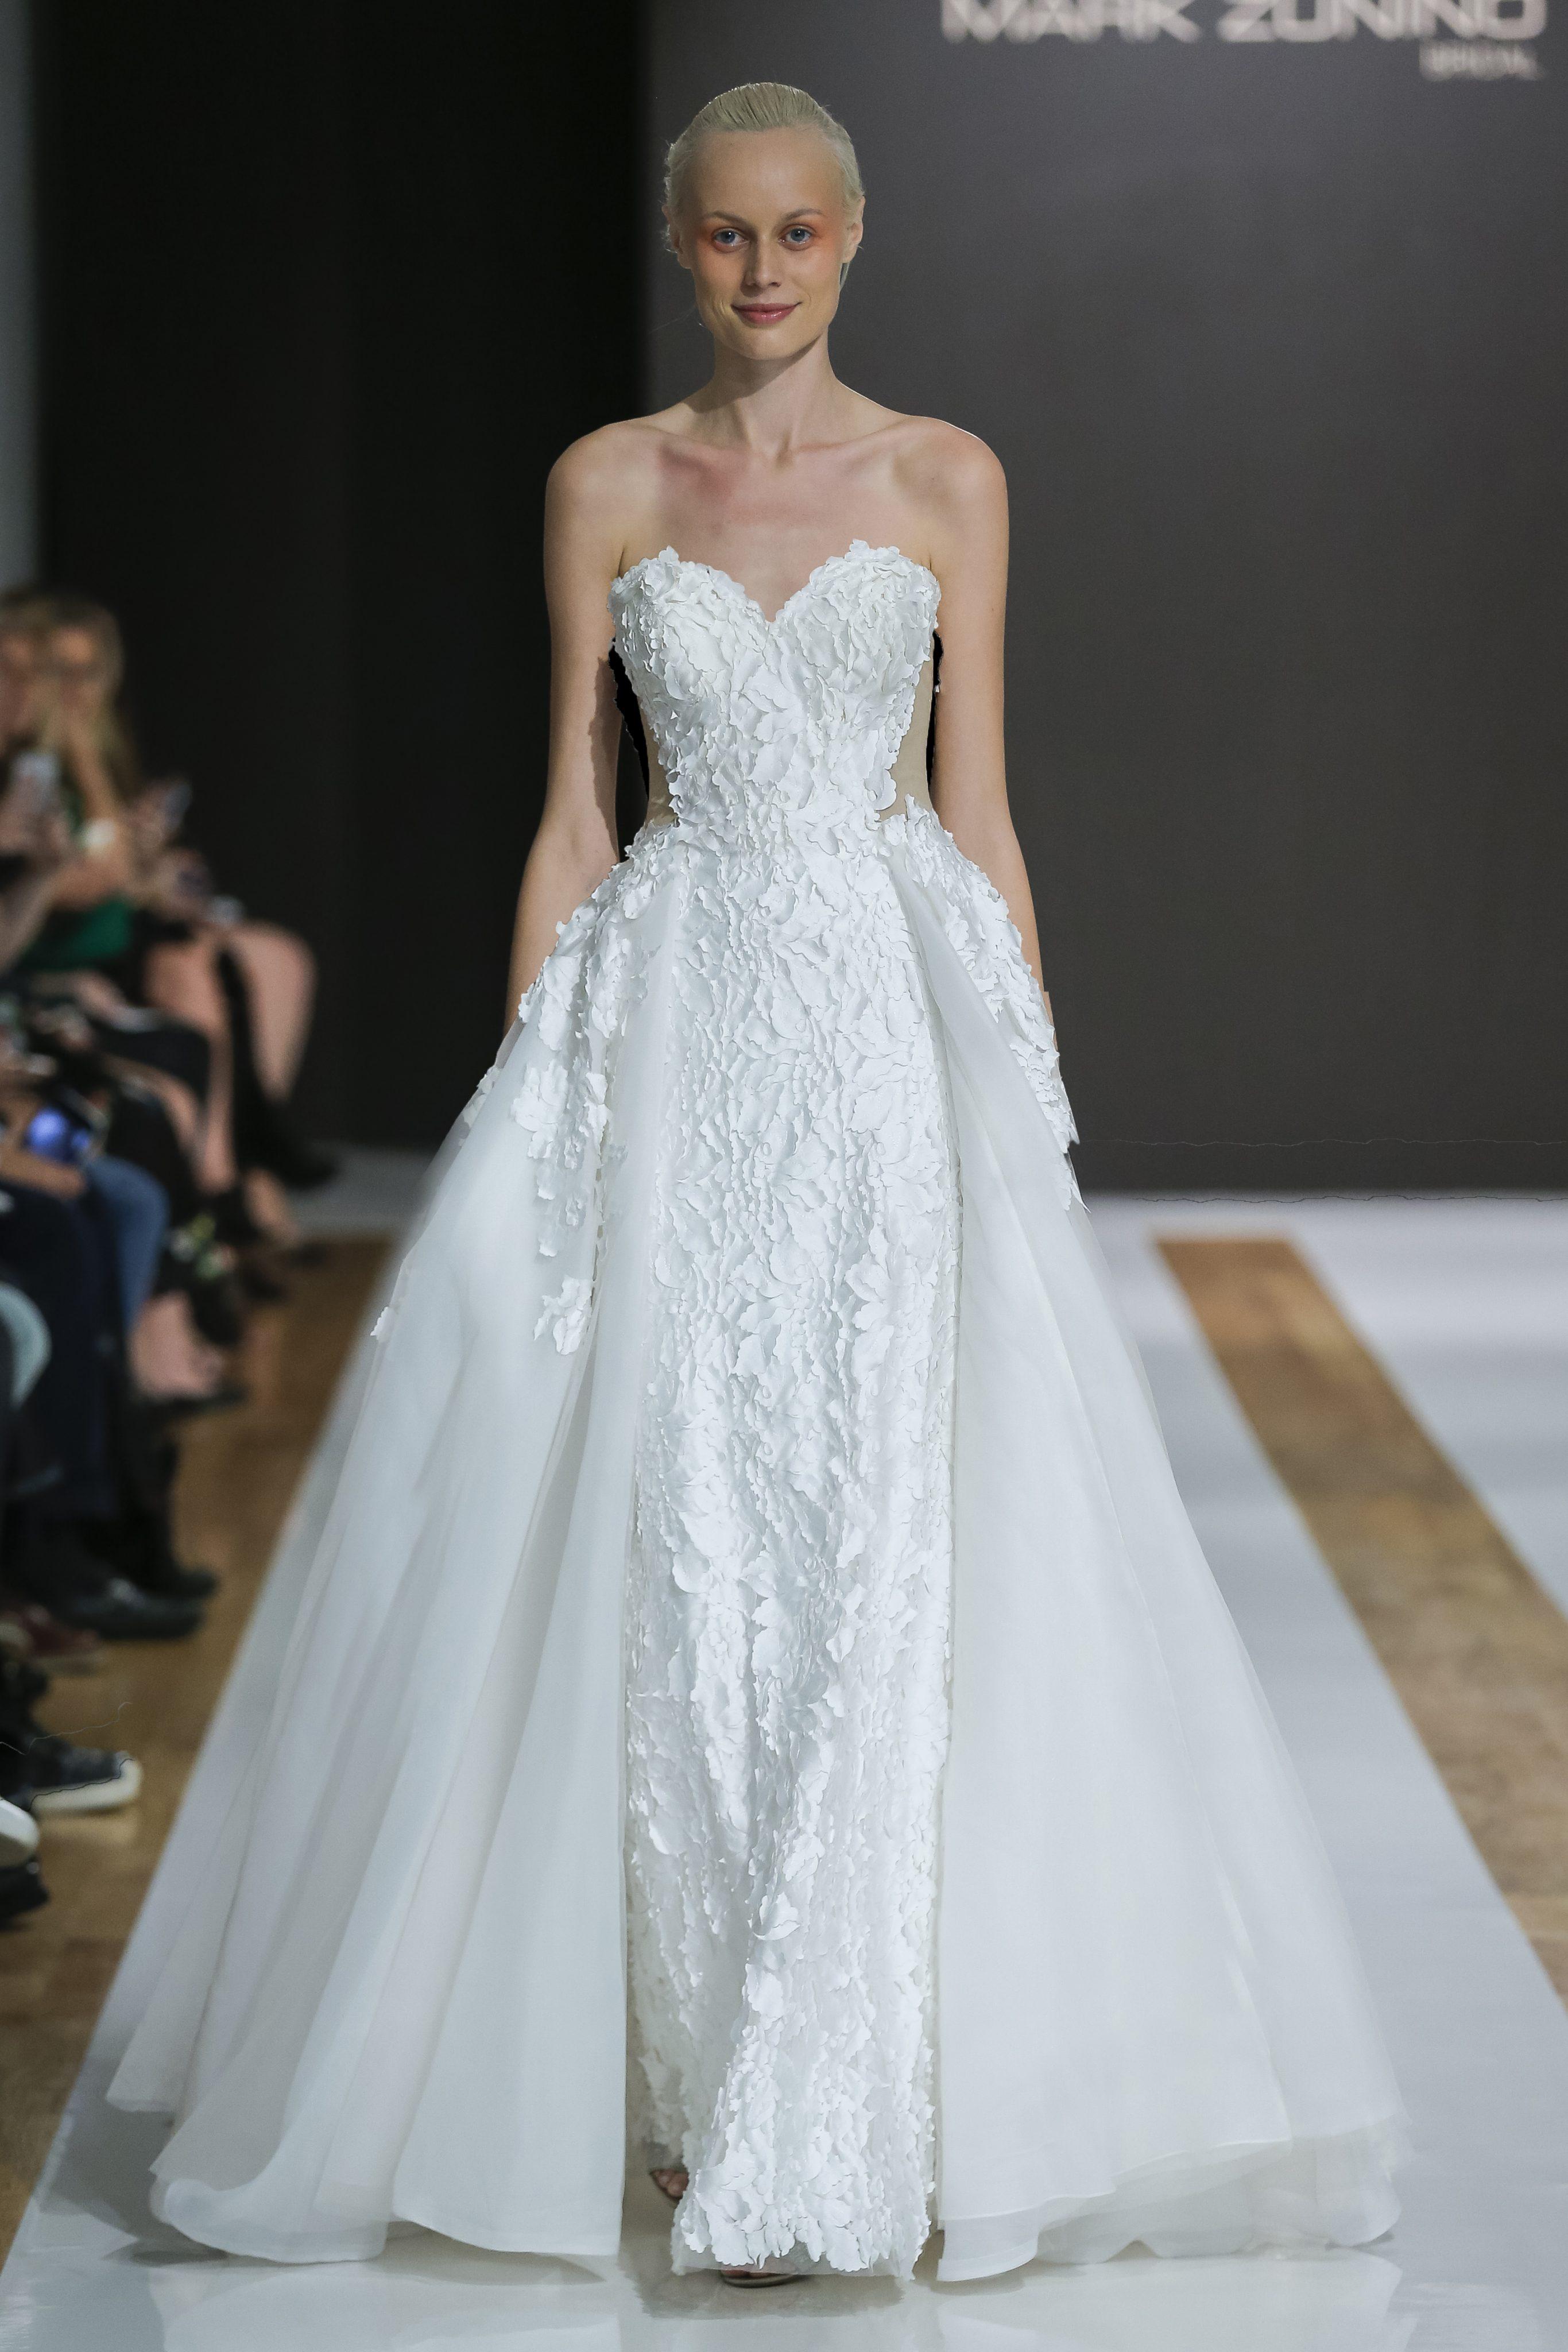 Sweetheart Neckline Floral Applique Strapless Ball Gown Wedding ...